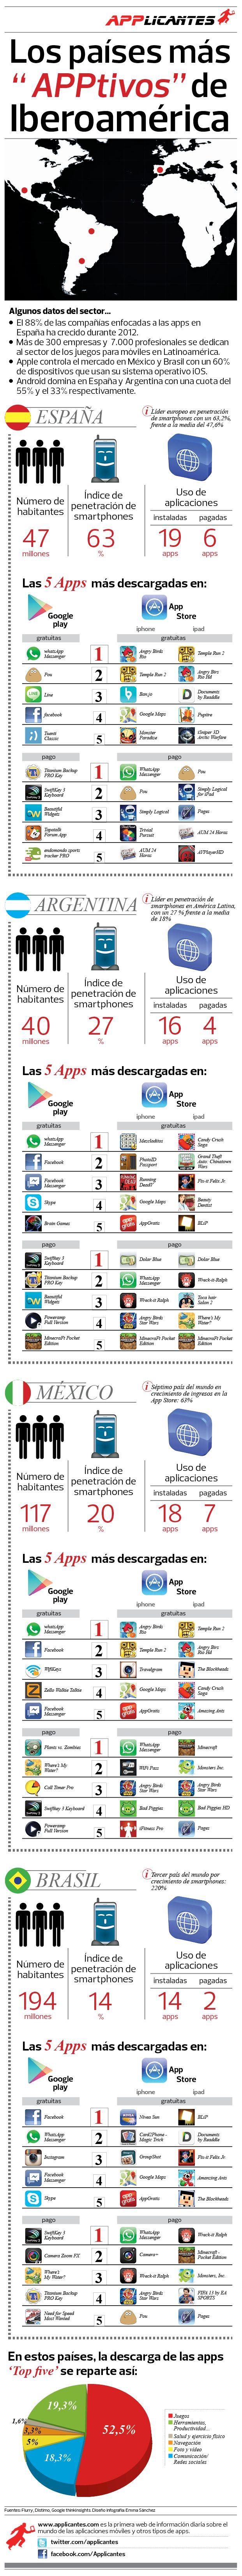 aplicaciones-iberoamerica